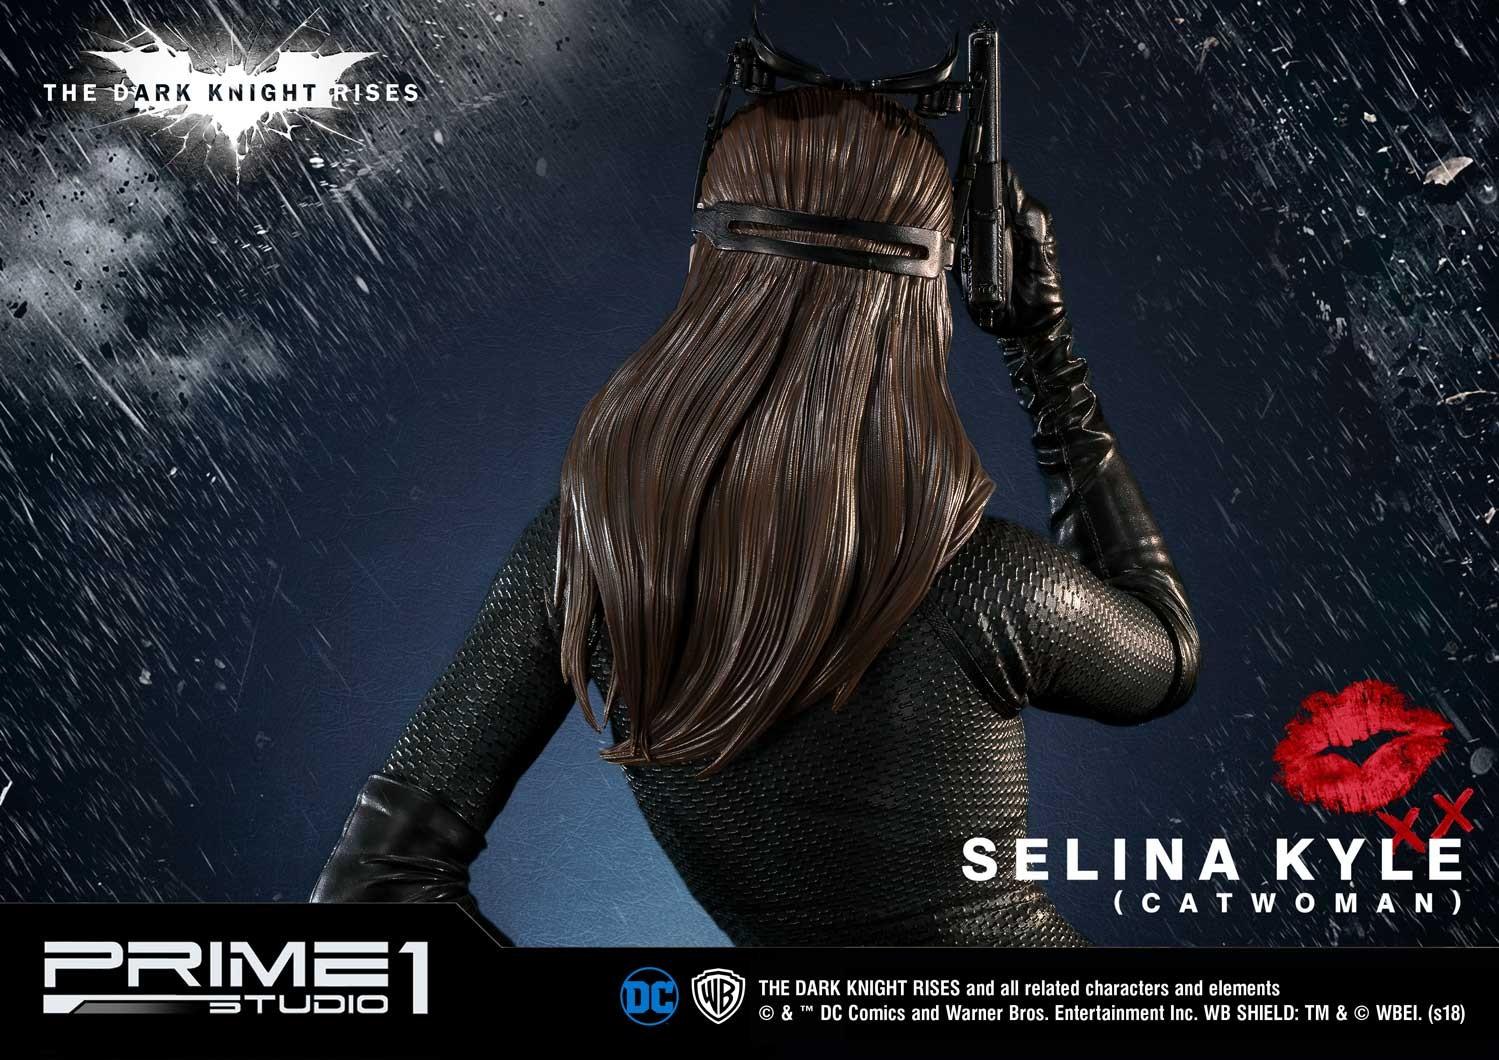 Catwoman (Selina Kyle) : Batman The Dark Knigh Rises (Prime 1 Studio) 5FqYHVNx_o